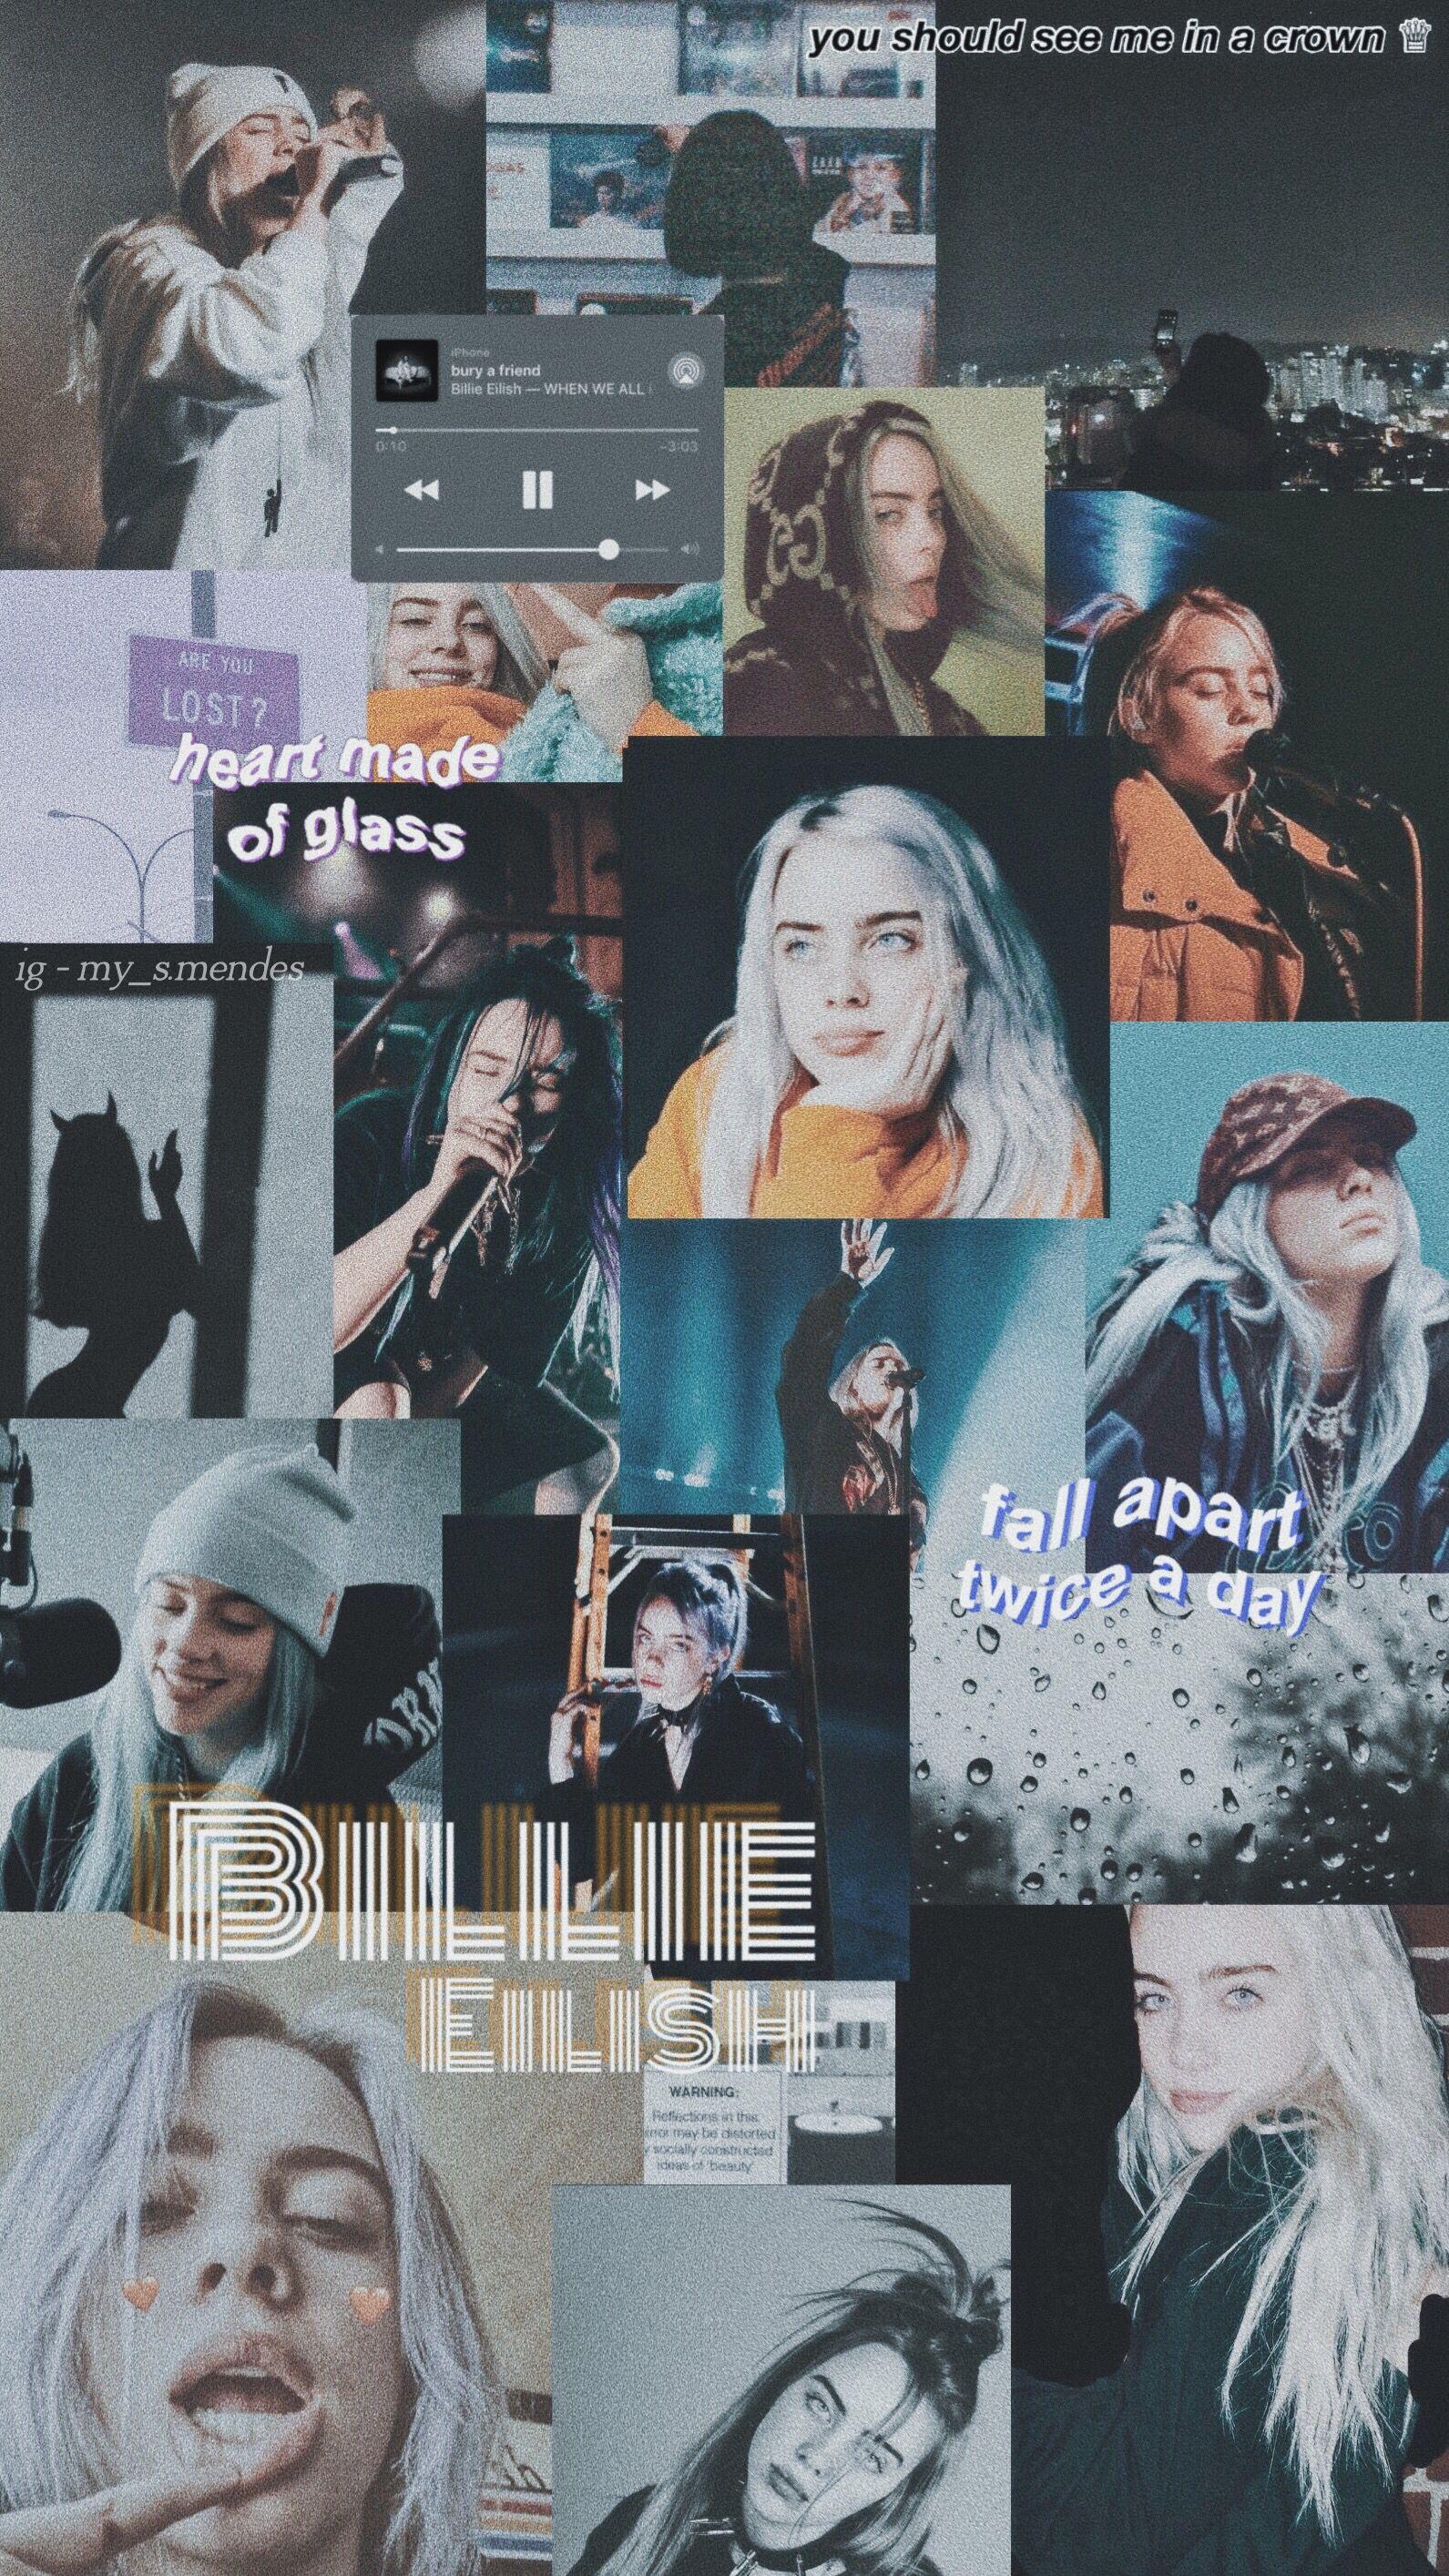 Follow Me On Instagram My S Mendes Billieeilish Billieeilishwallpaper Wallpape Lindos Dibujos Tumblr Fondos De Pantalla Verde Ideas De Fondos De Pantalla